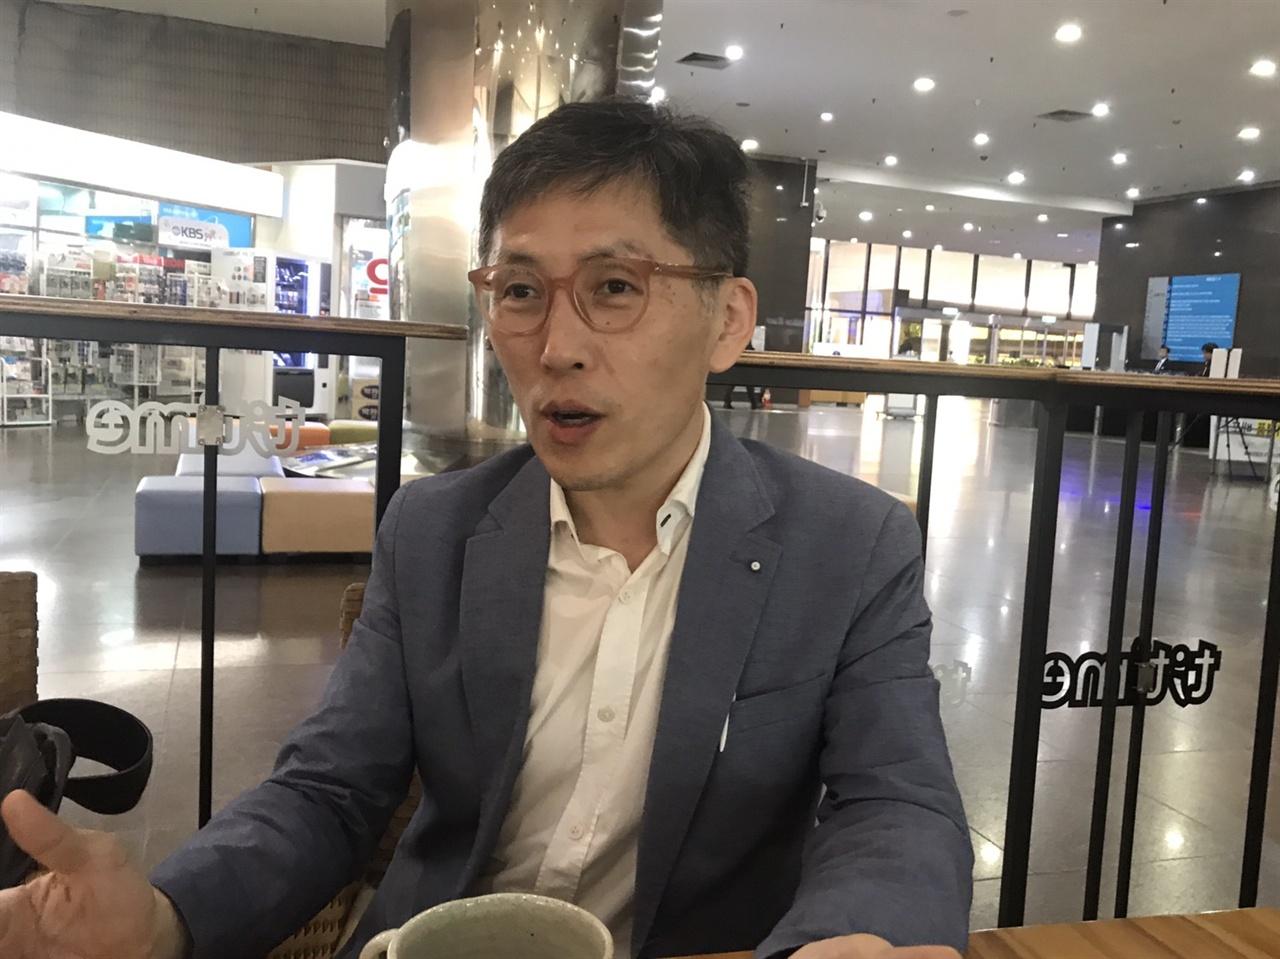 <KBS스페셜> '플라스틱 지구'의 송웅달 CP